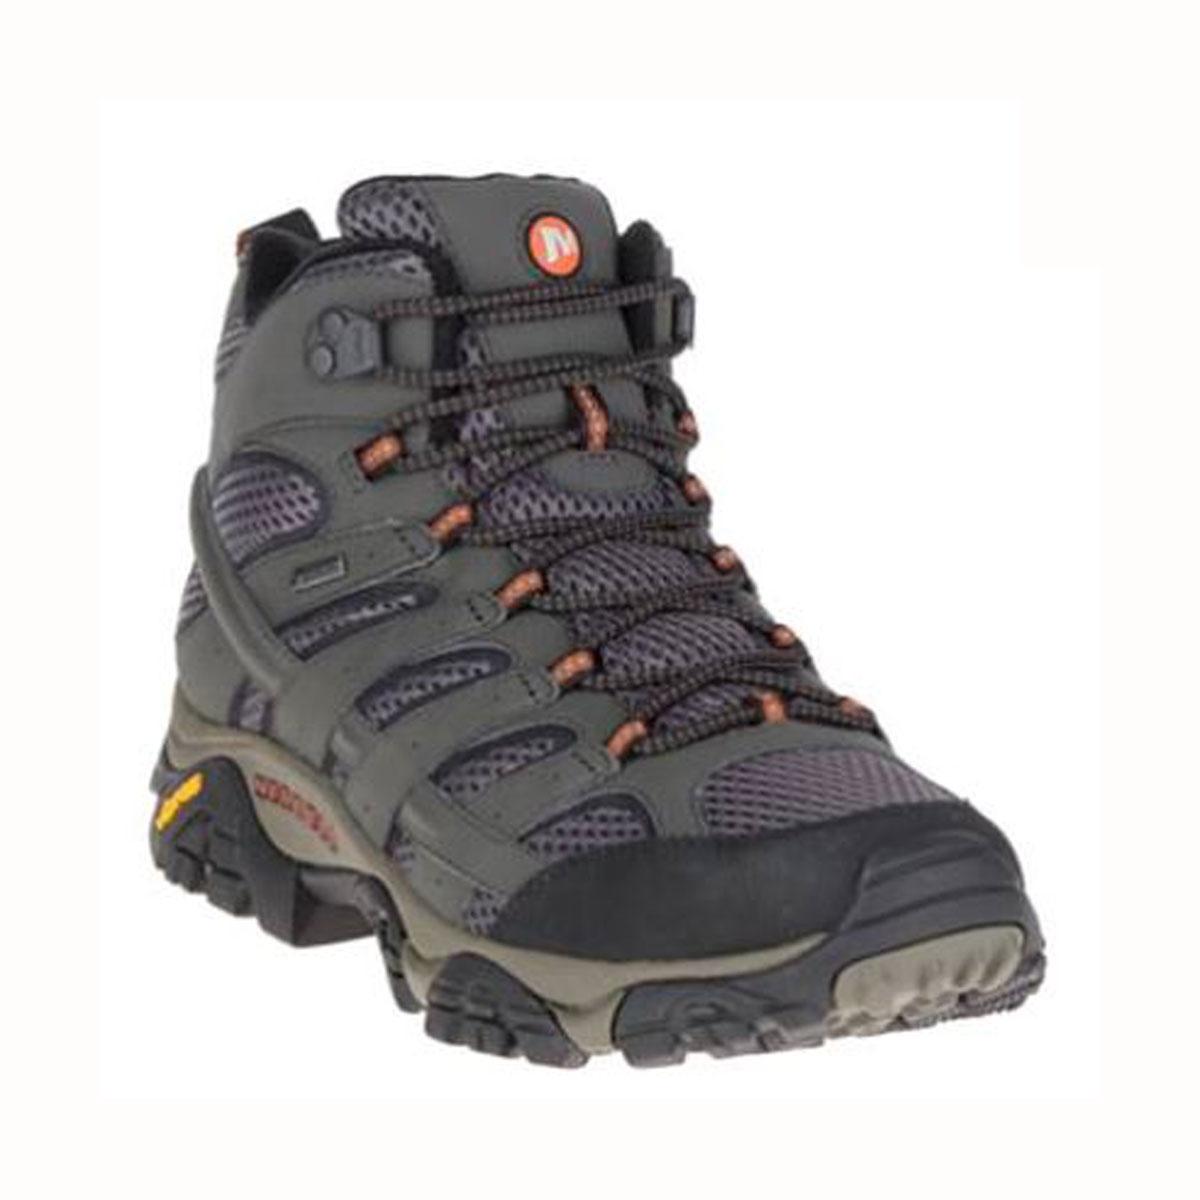 dfd179c5b938 Image of Merrell Moab 2 MID GTX Walking Boots (Men s) - Beluga